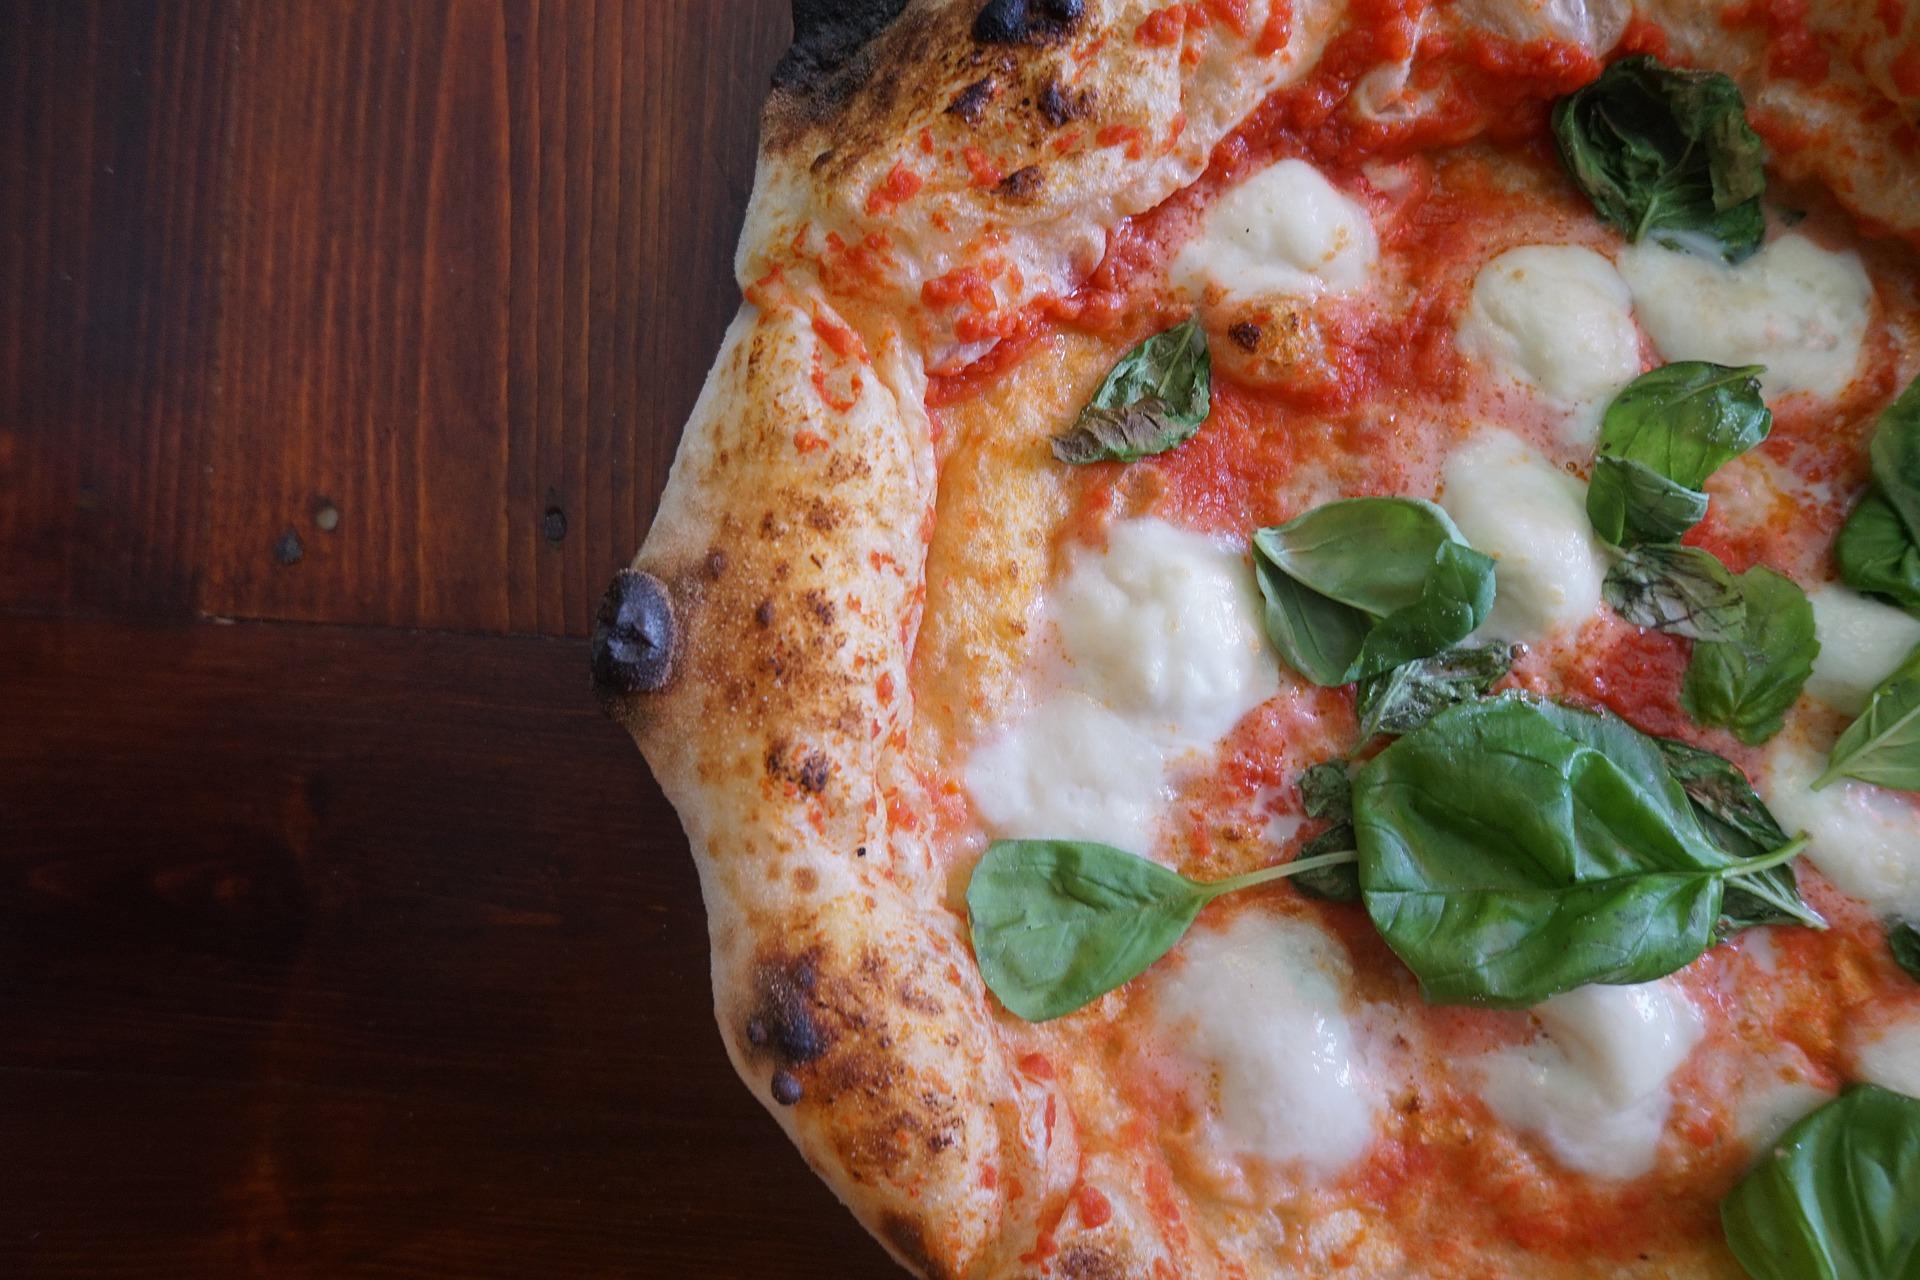 pizza5001588_1920.jpg